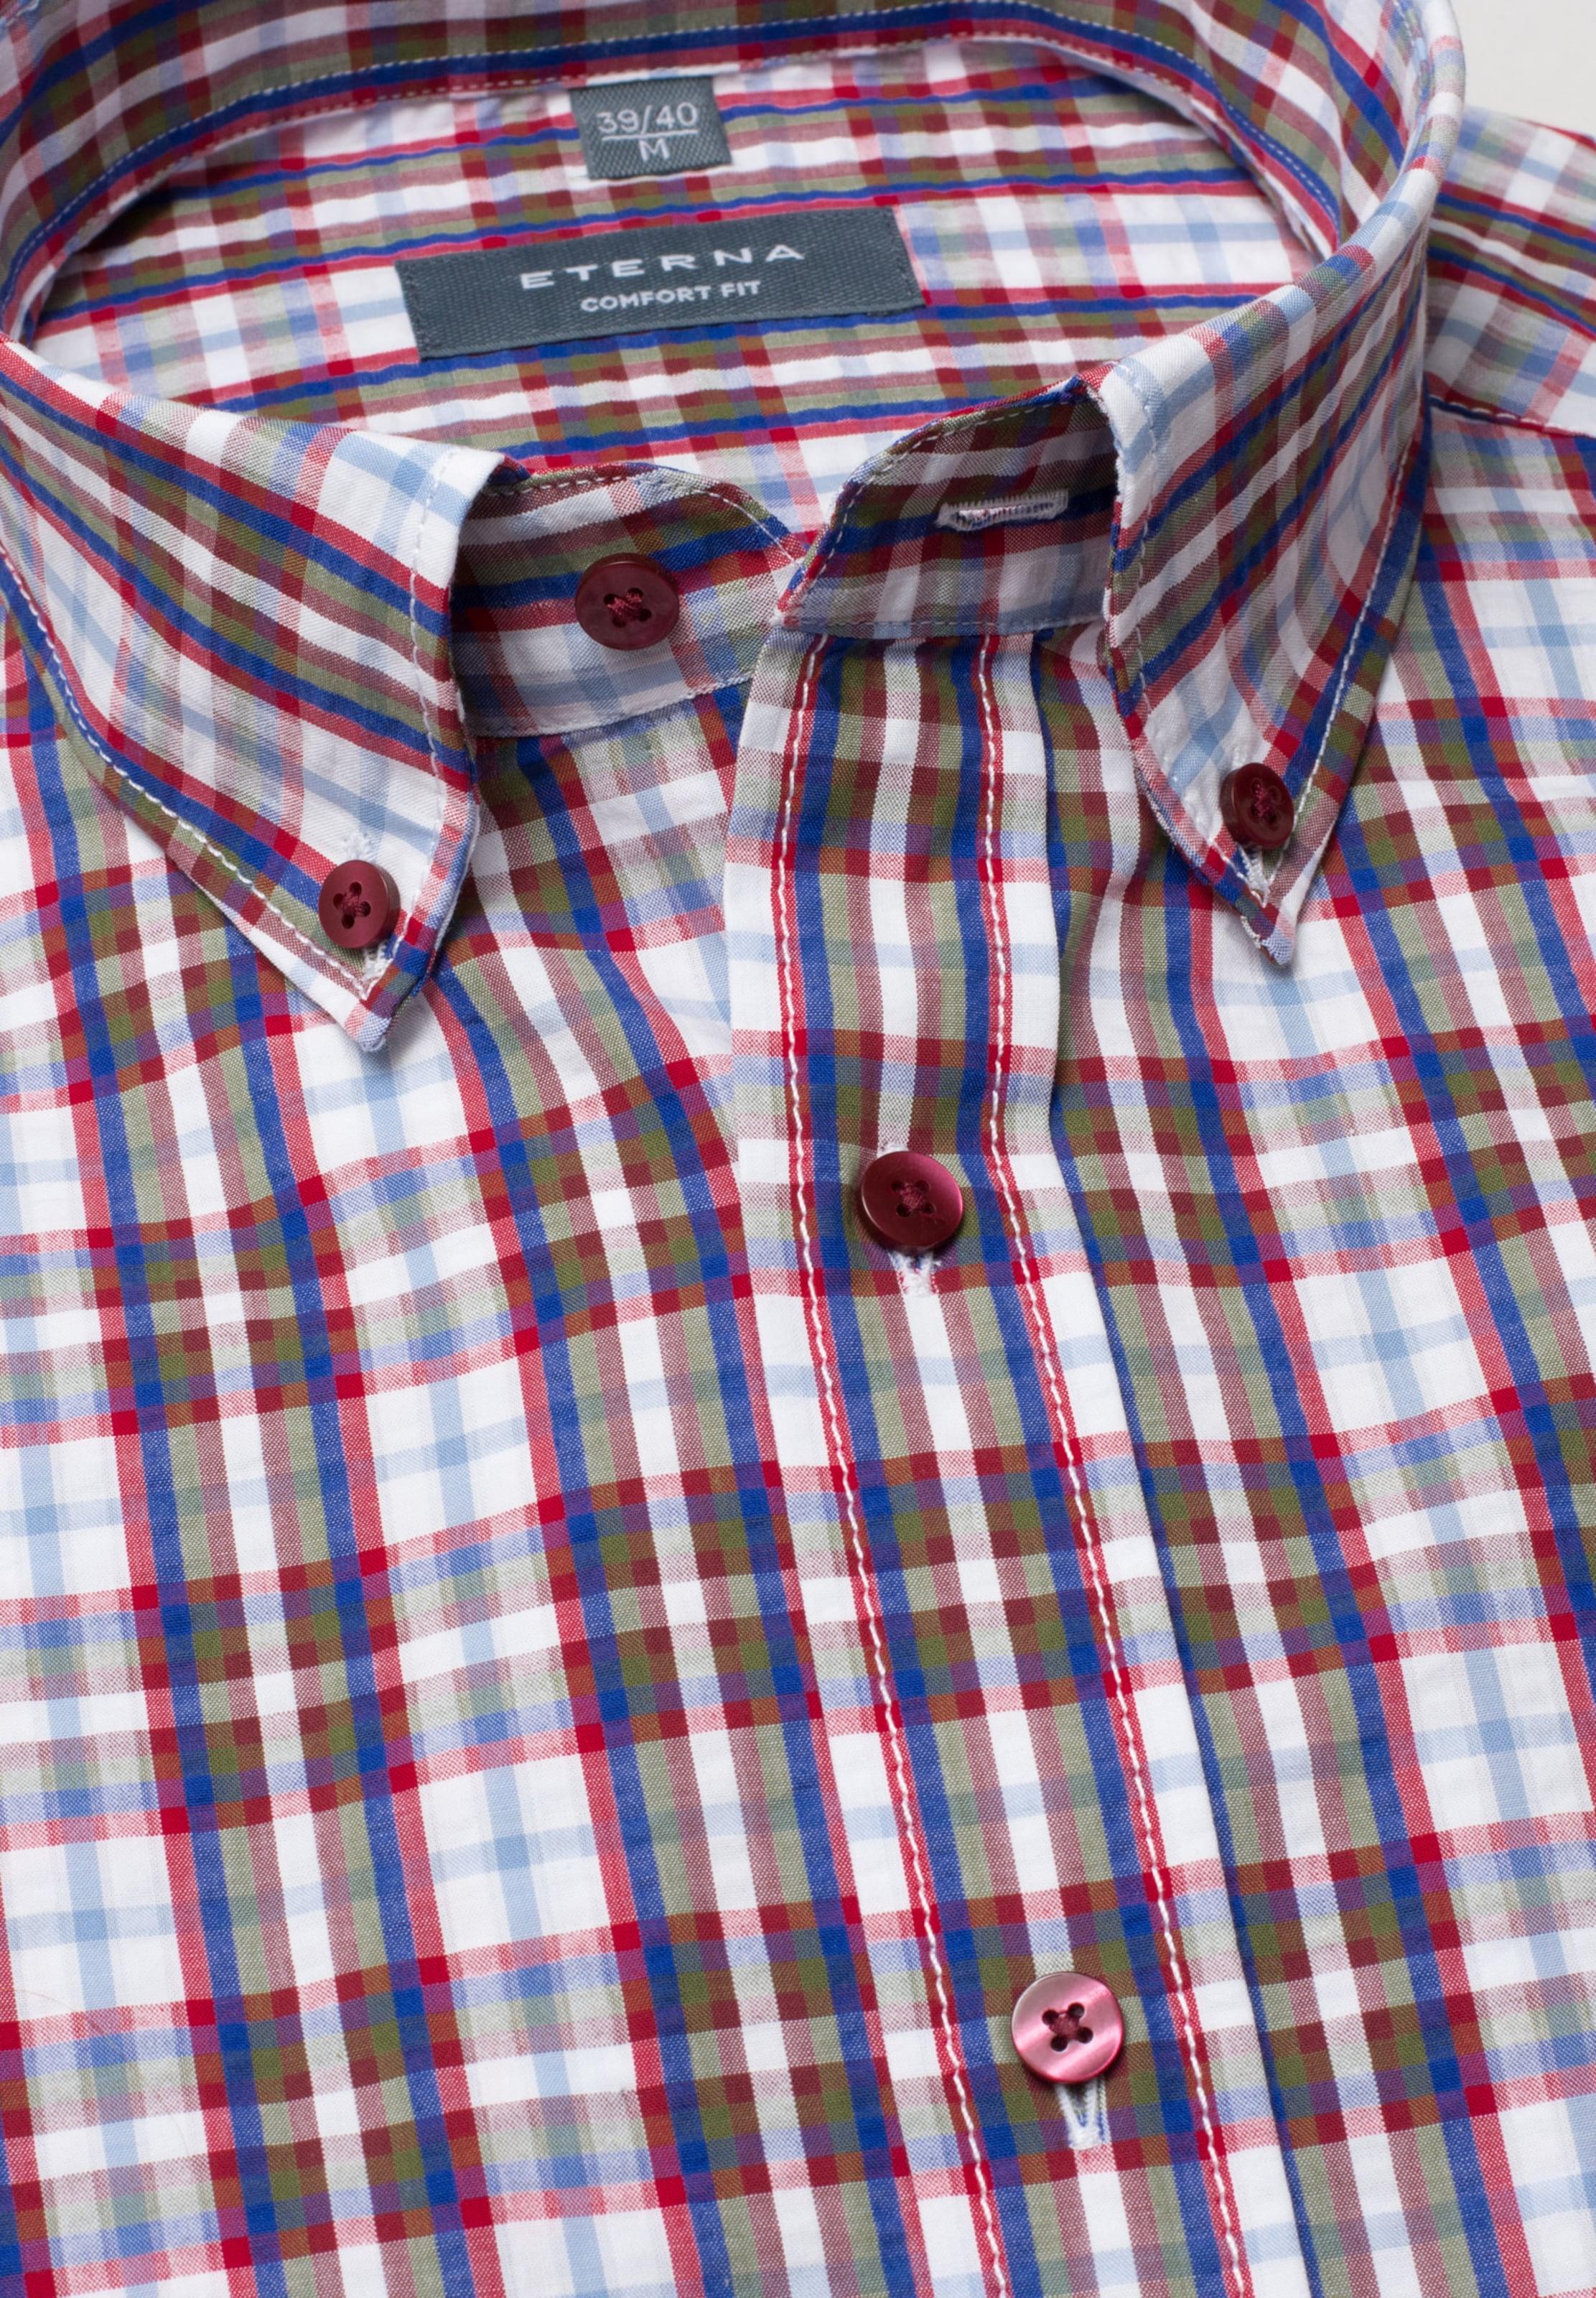 In Kurzarmhemd Weiß Eterna Kurzarmhemd In BlauRot Eterna N0m8vwOn